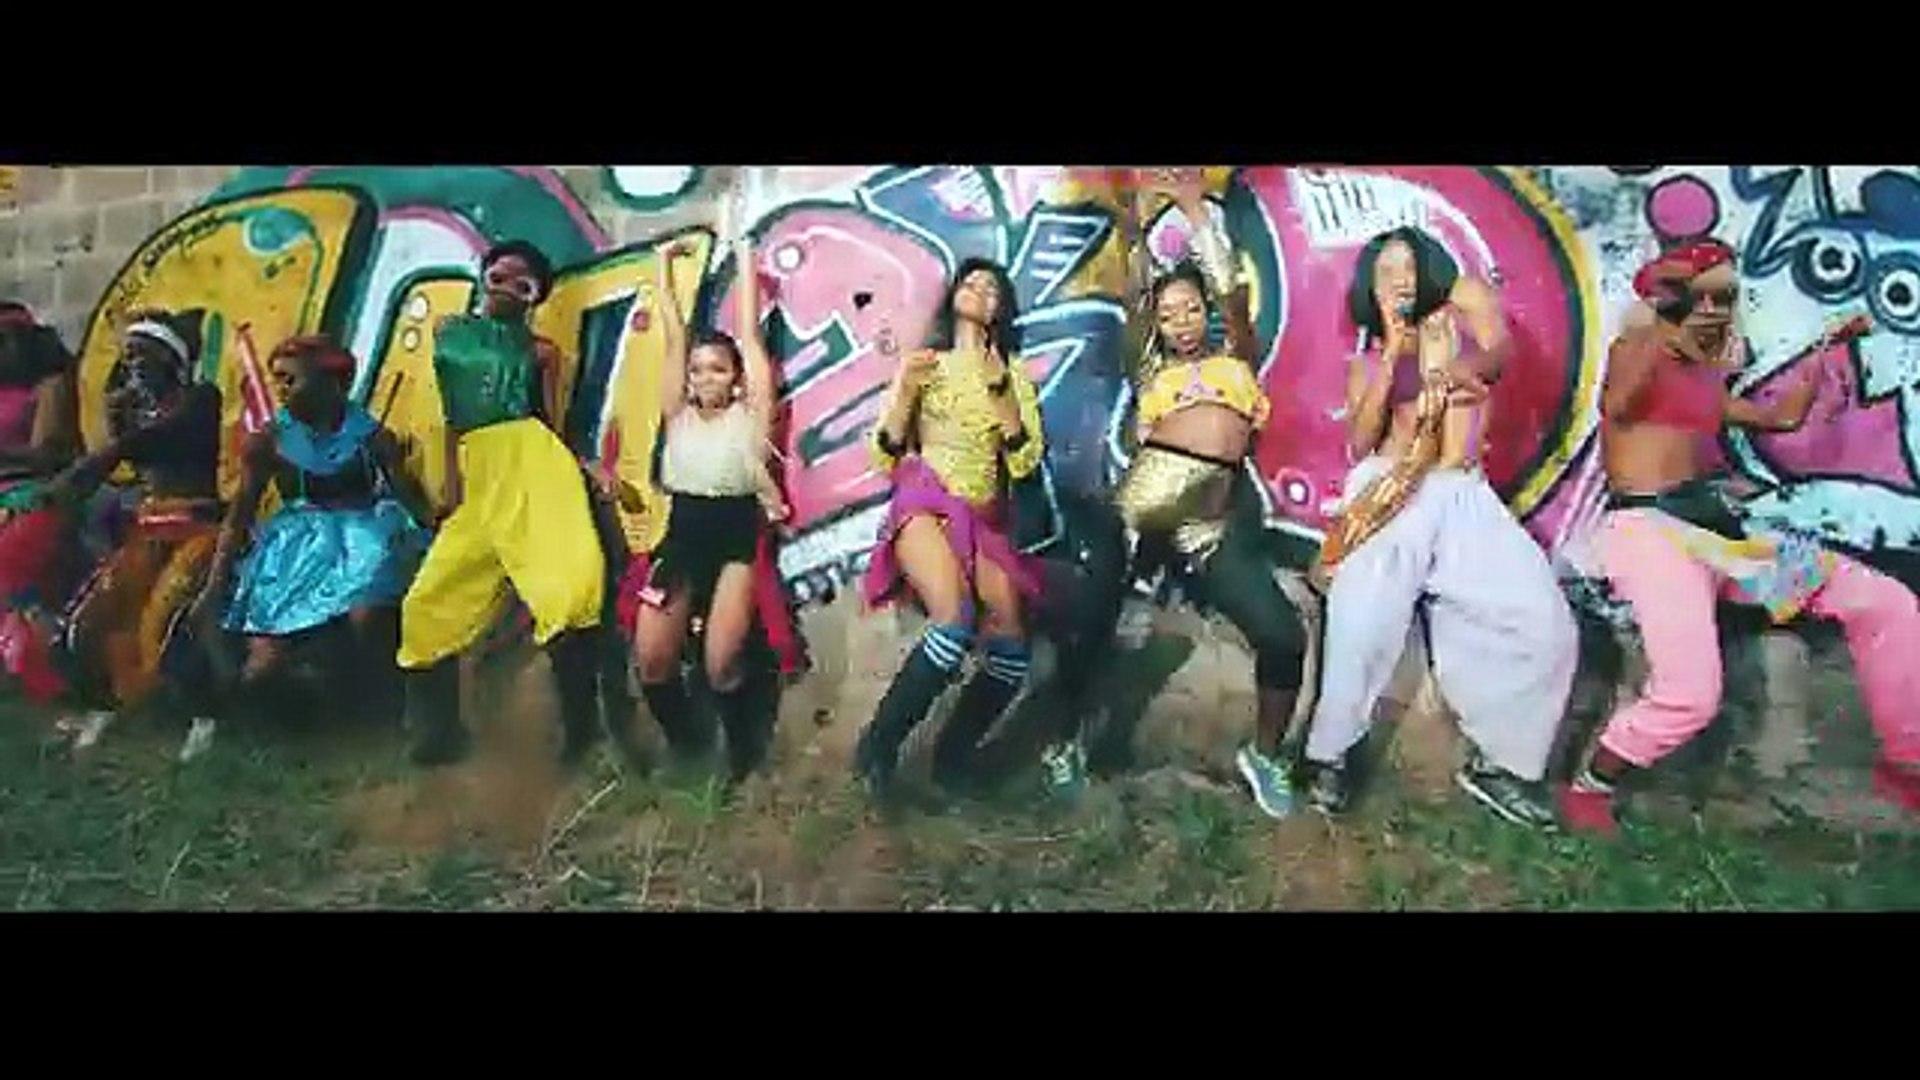 STARBOY - SOCO ft. TERRI X SPOTLESS X CEEZA MILLI X WIZKID (OFFICIAL VIDEO)